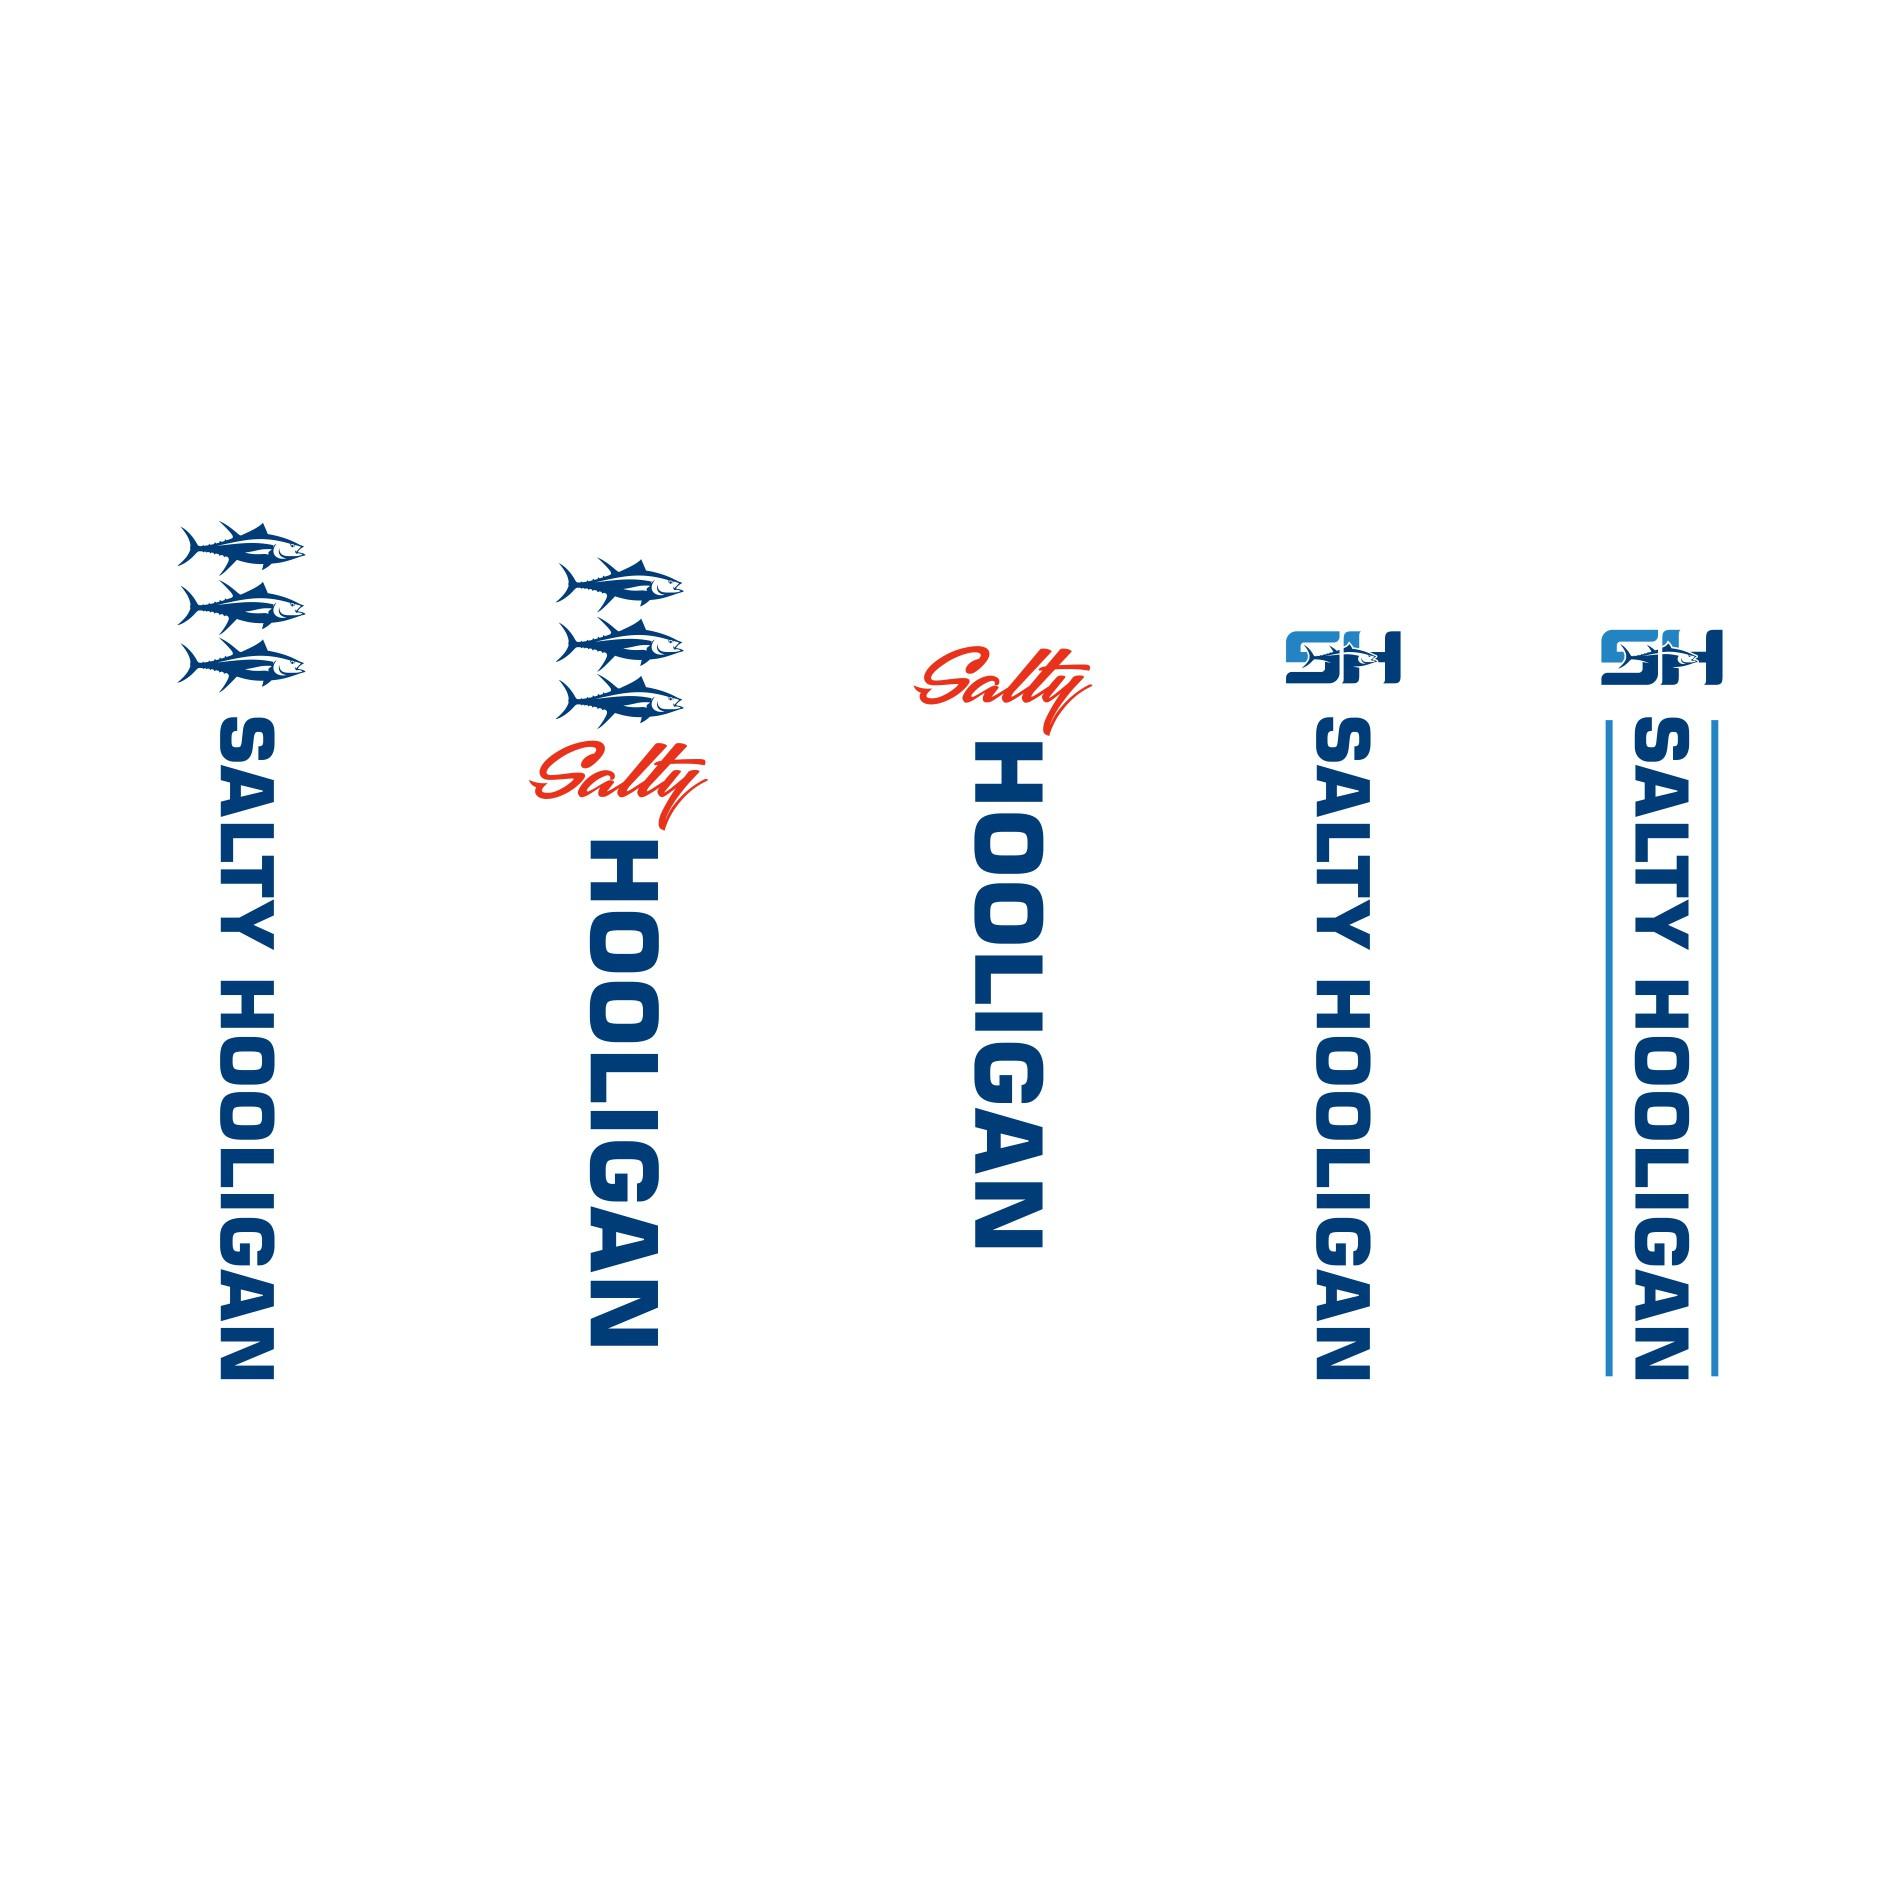 Neck label, sleeve print & upf 50 logo for sleeve